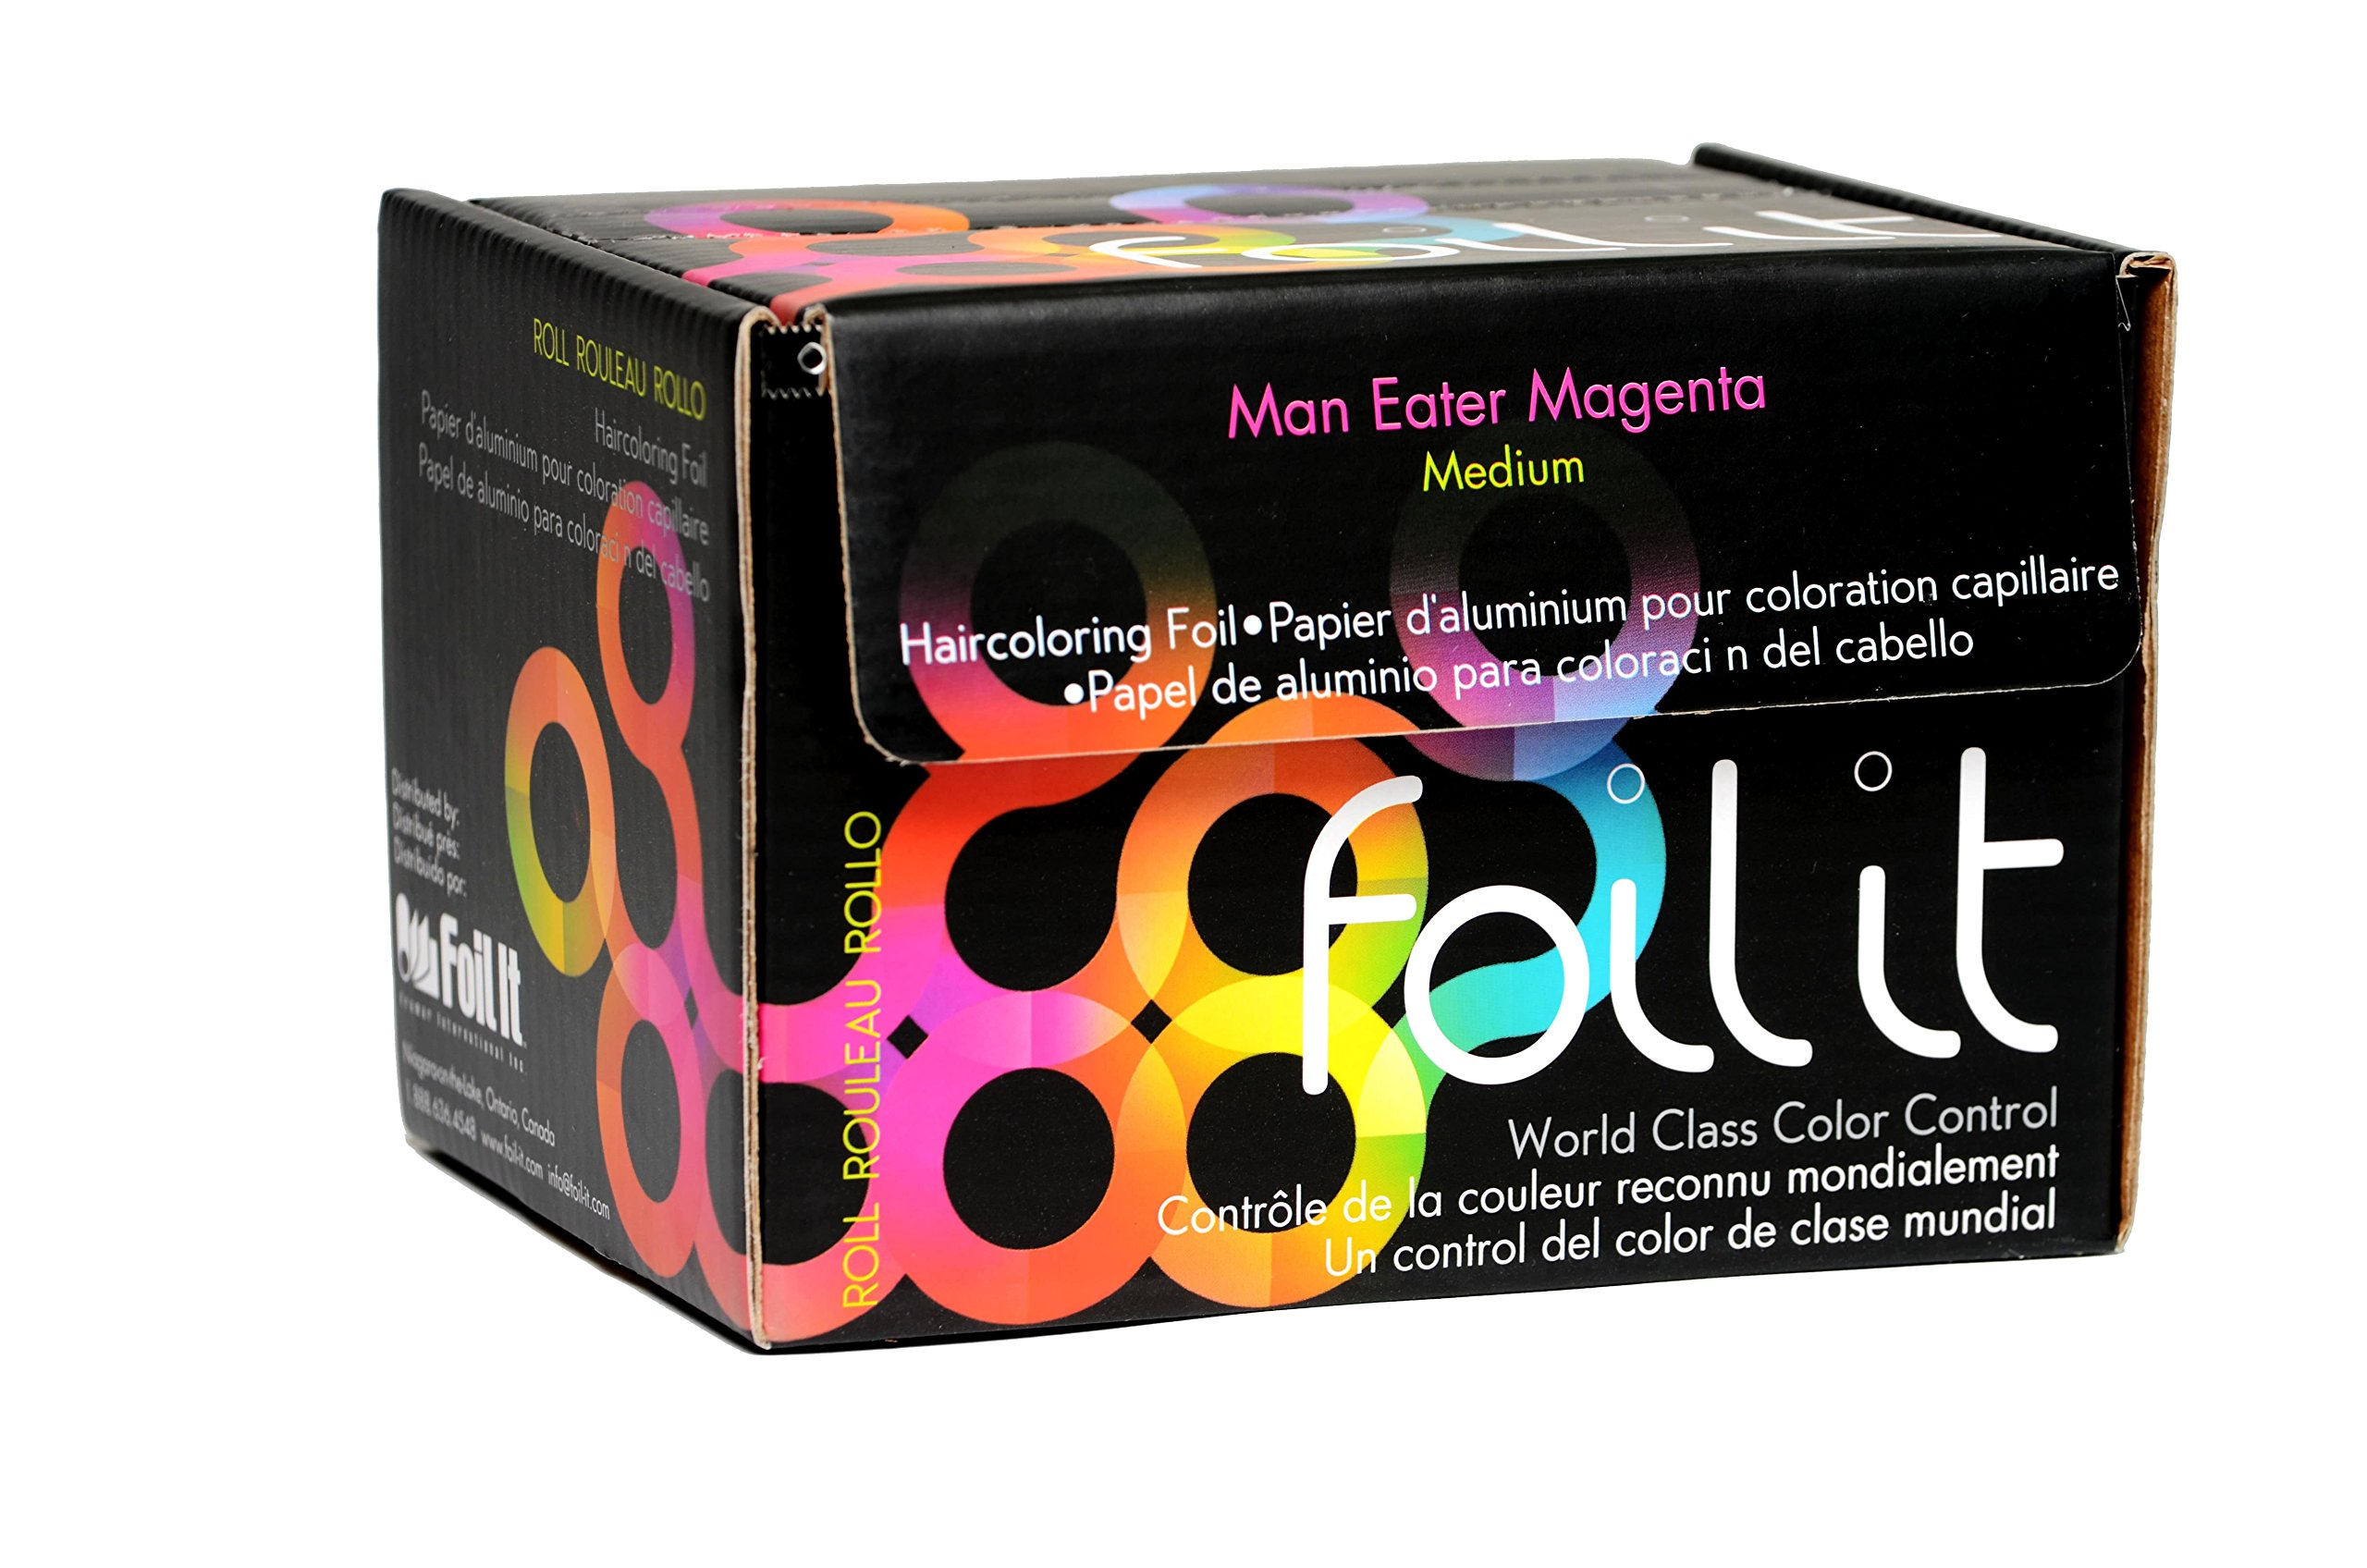 Framar Magenta Aluminum Foil Roll, Foil Paper- Medium 1600 ft by FRAMAR (Image #4)